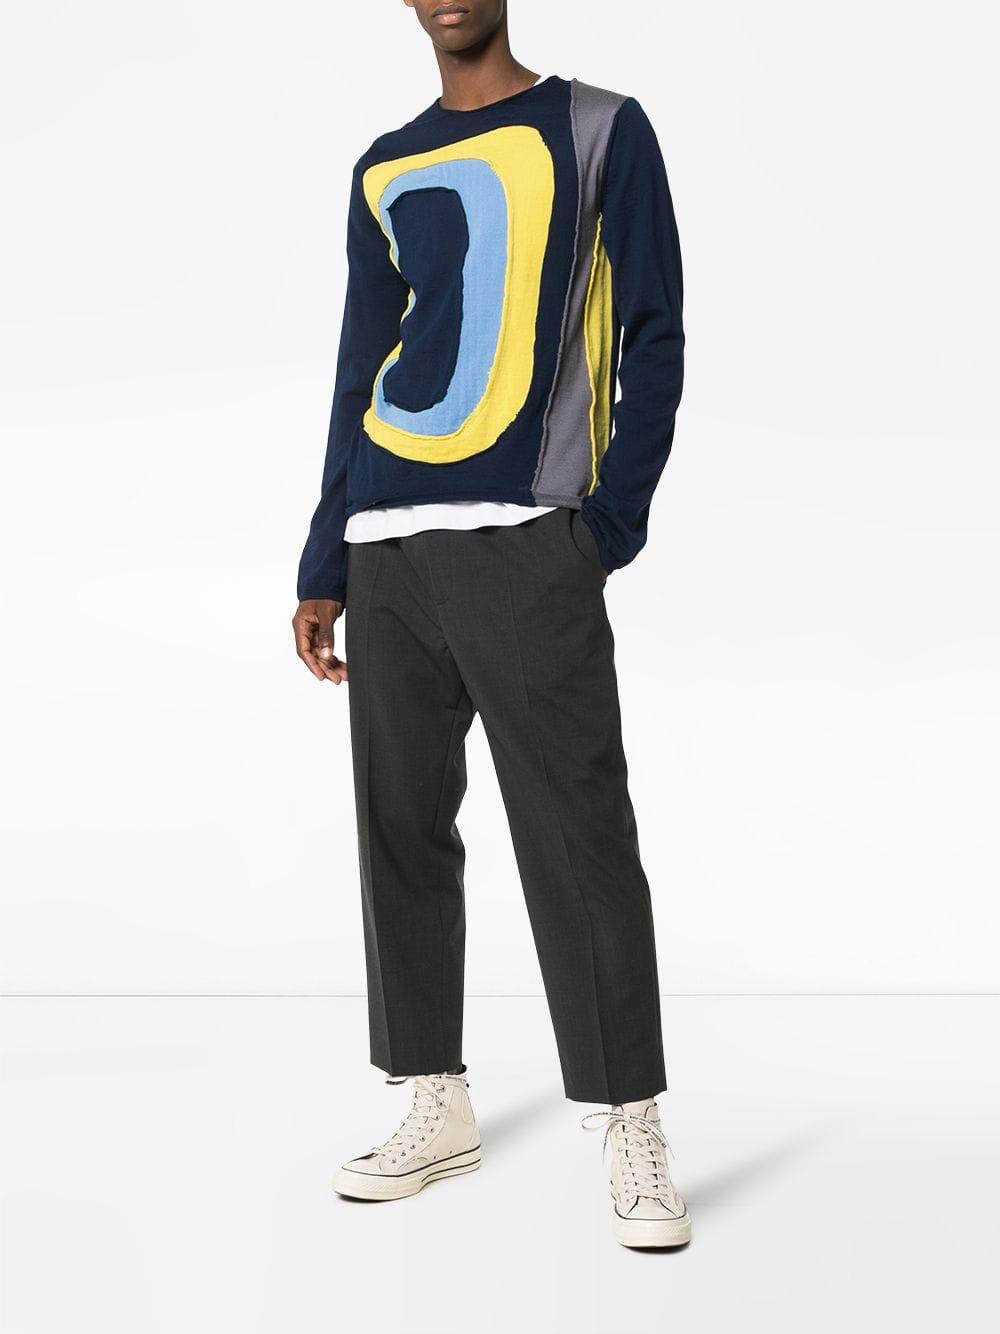 Wool Men In Knit Blue For Garçons Comme Sweatshirt Des Lyst Panel qBpFgwIg